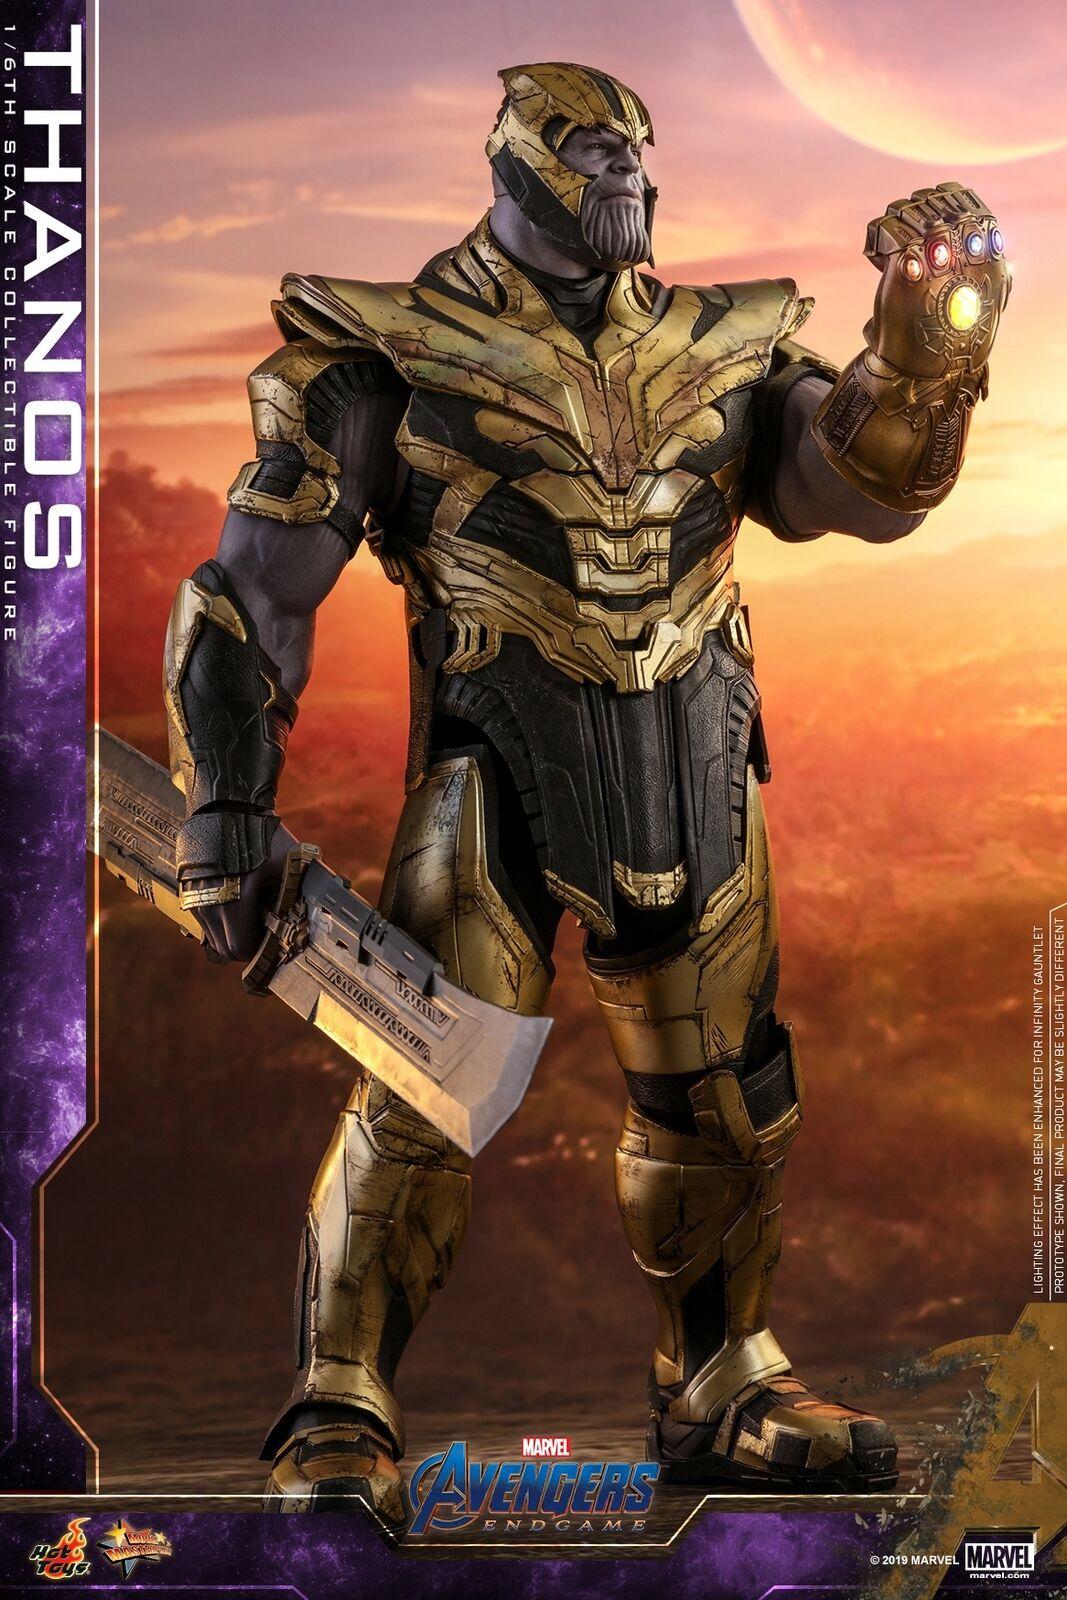 Hot Juguetes 1 6th escala figura Thanos Vengadores Tacho Coleccionable MMS529